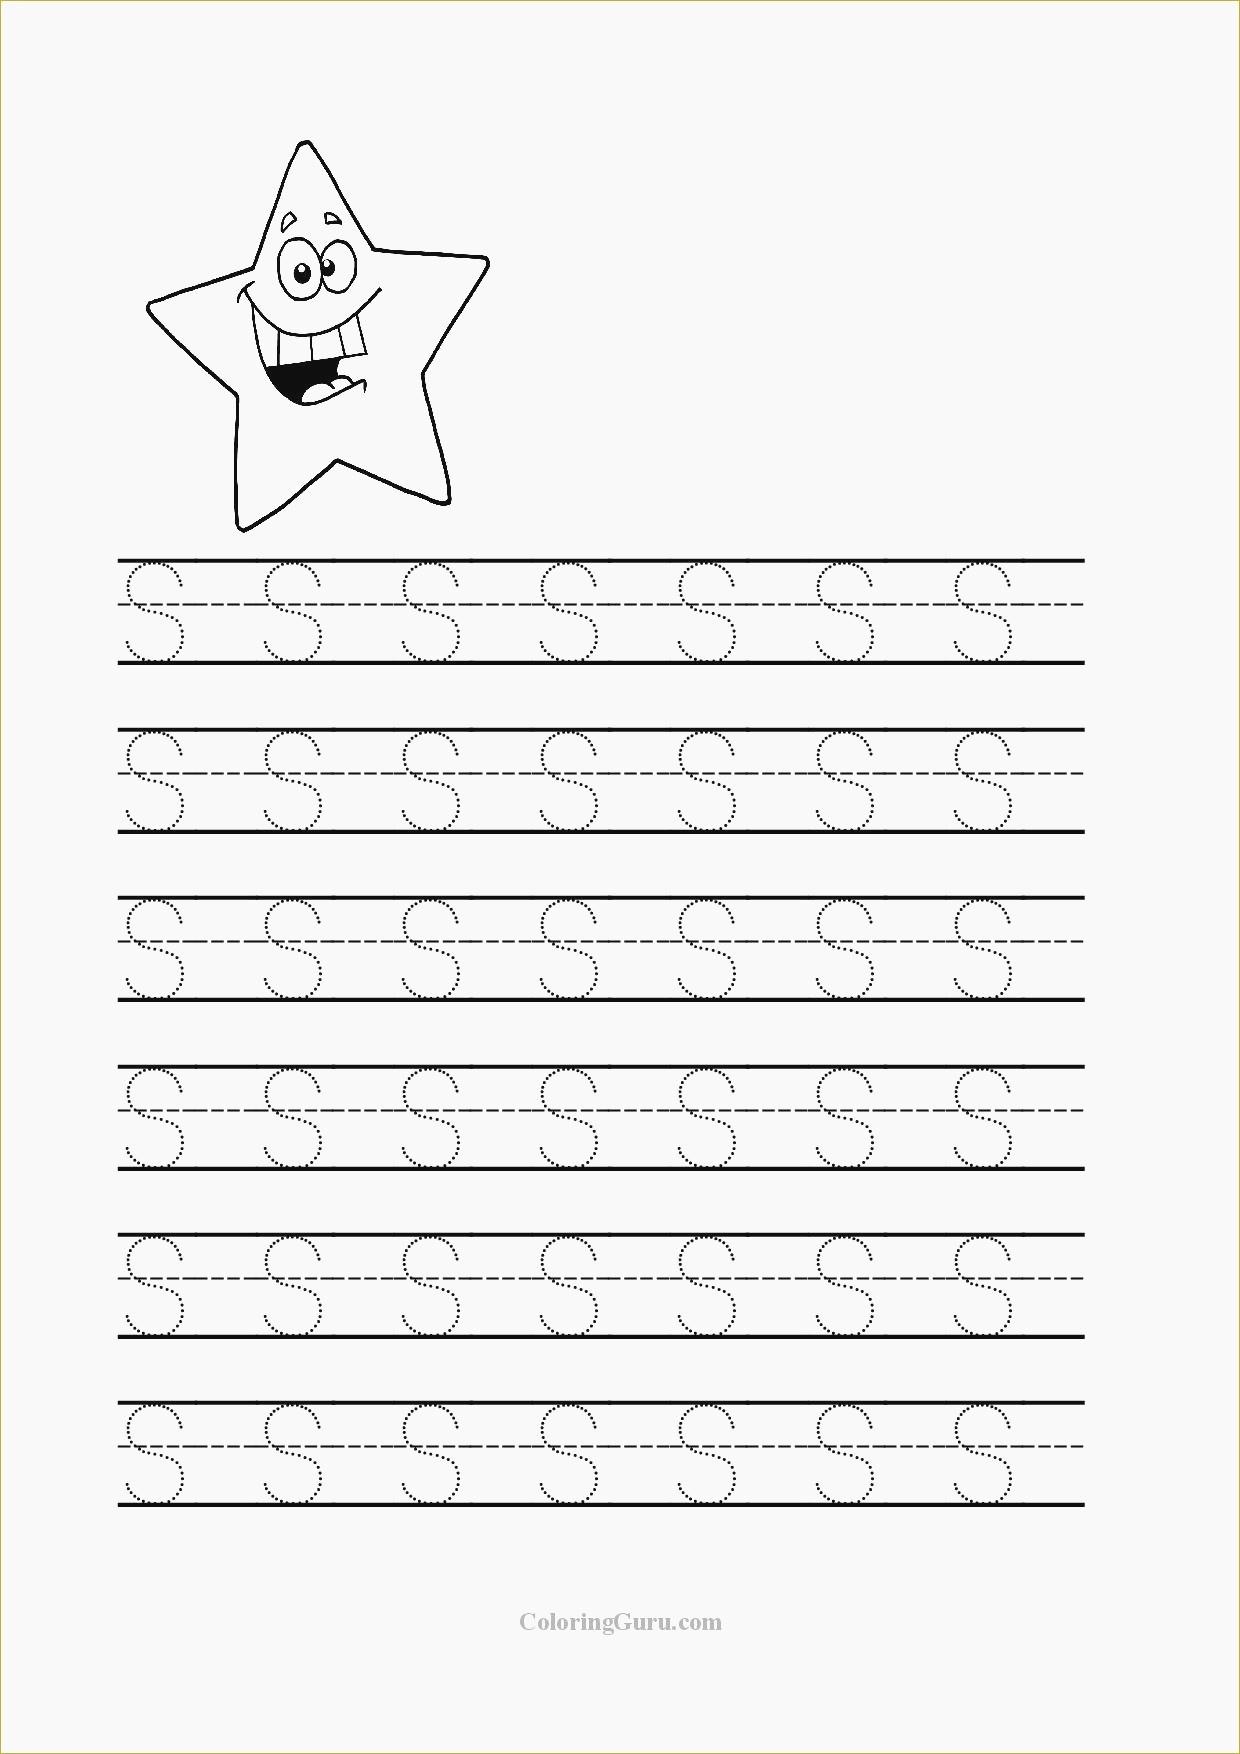 Printable Tracing Paper Beautiful Free Name Tracing Worksheets For - Free Printable Name Tracing